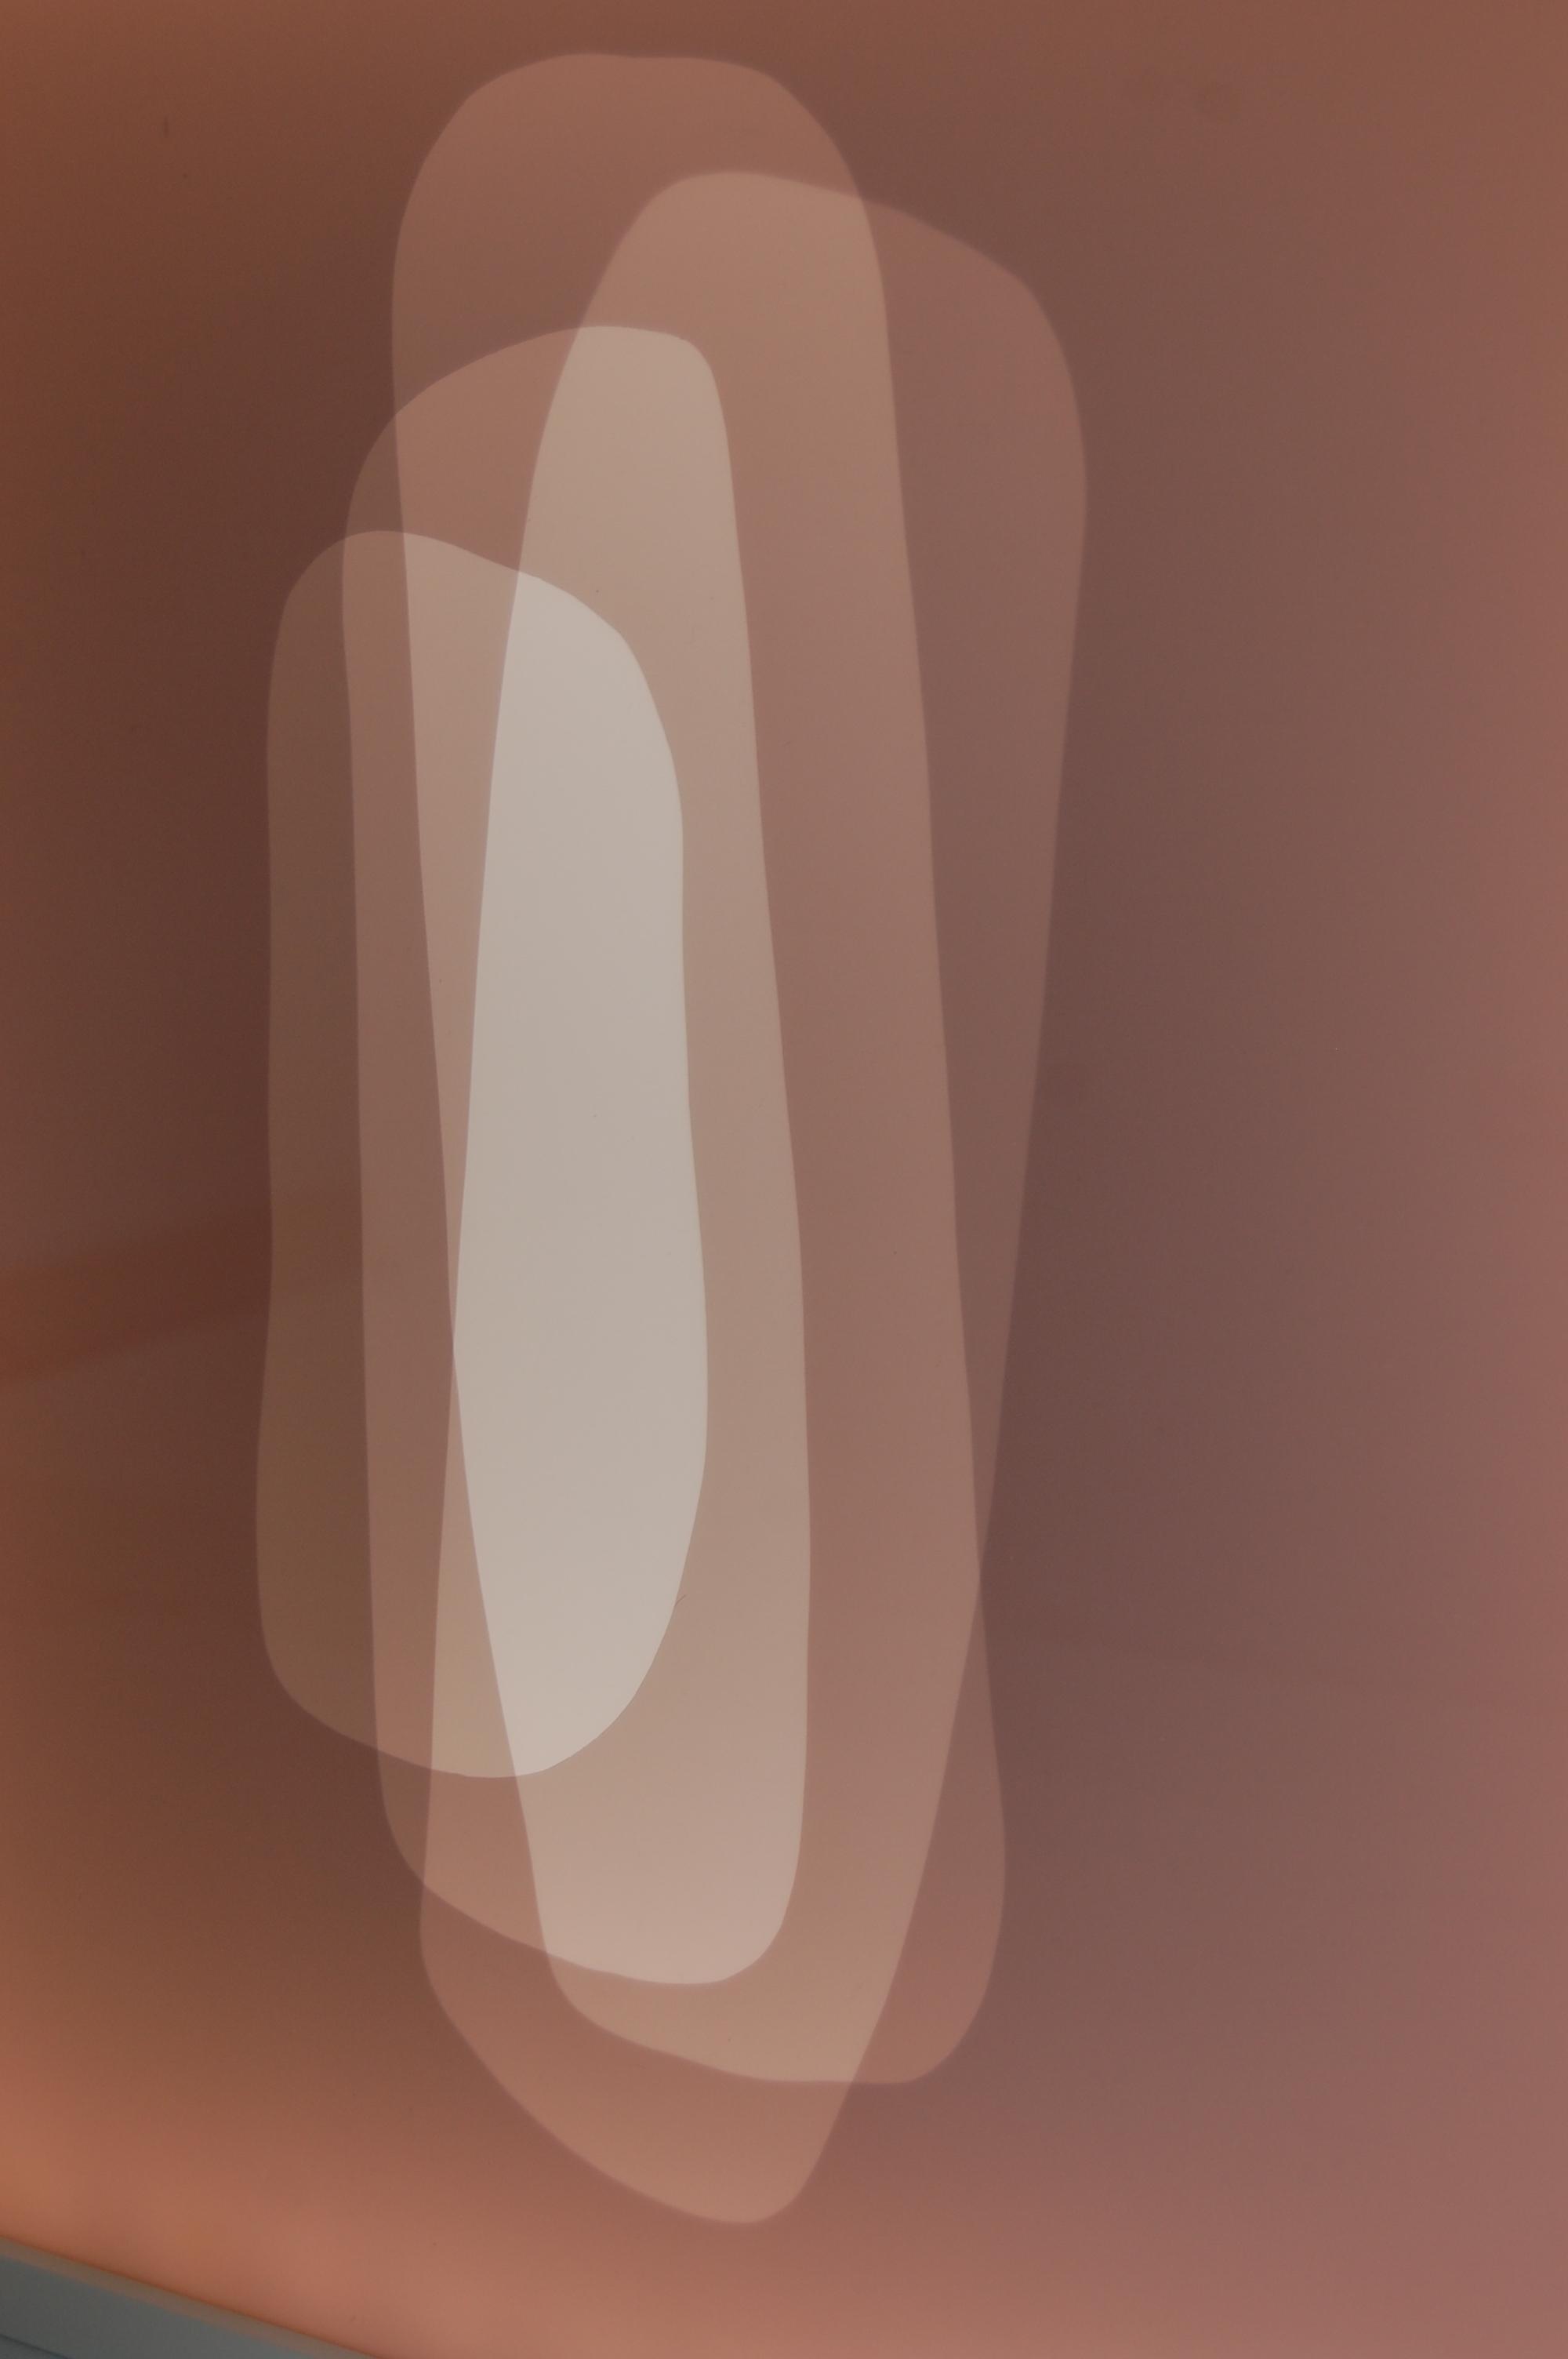 paula-del-rivero-modern-abstract-art_gyne1_detail2